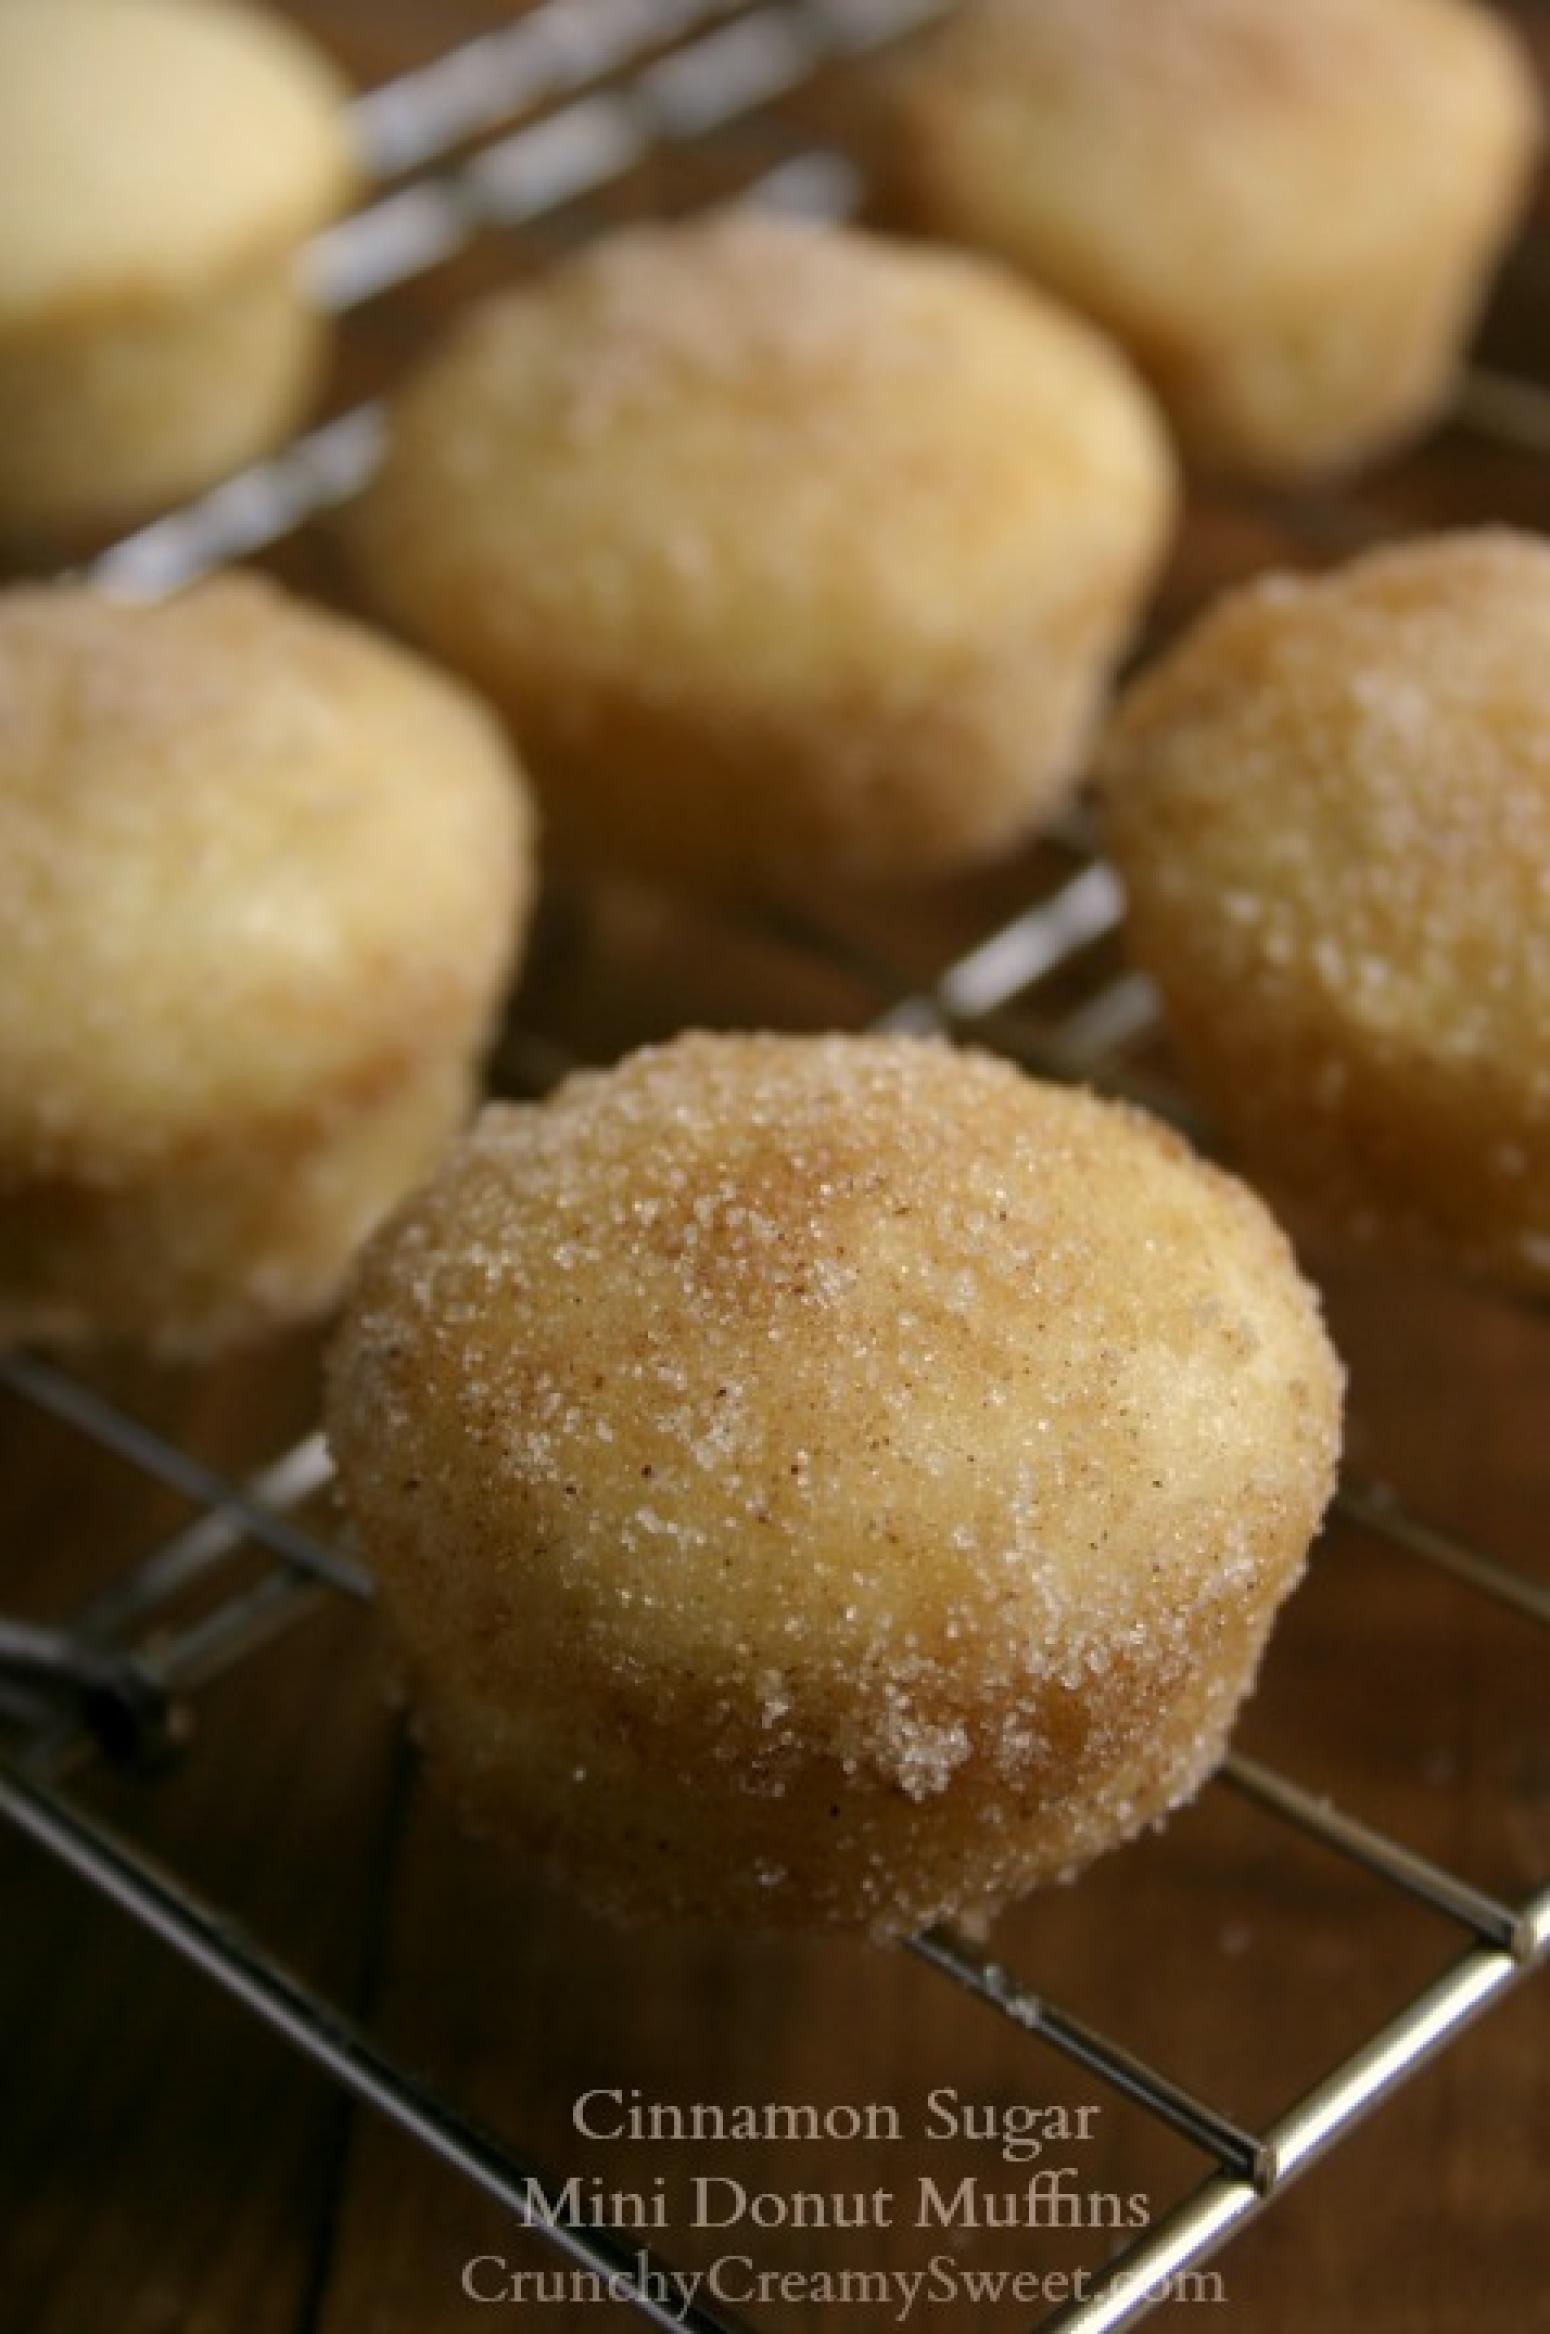 Cinnamon Sugar Mini Donut Muffins Recipe 2 | Just A Pinch ...